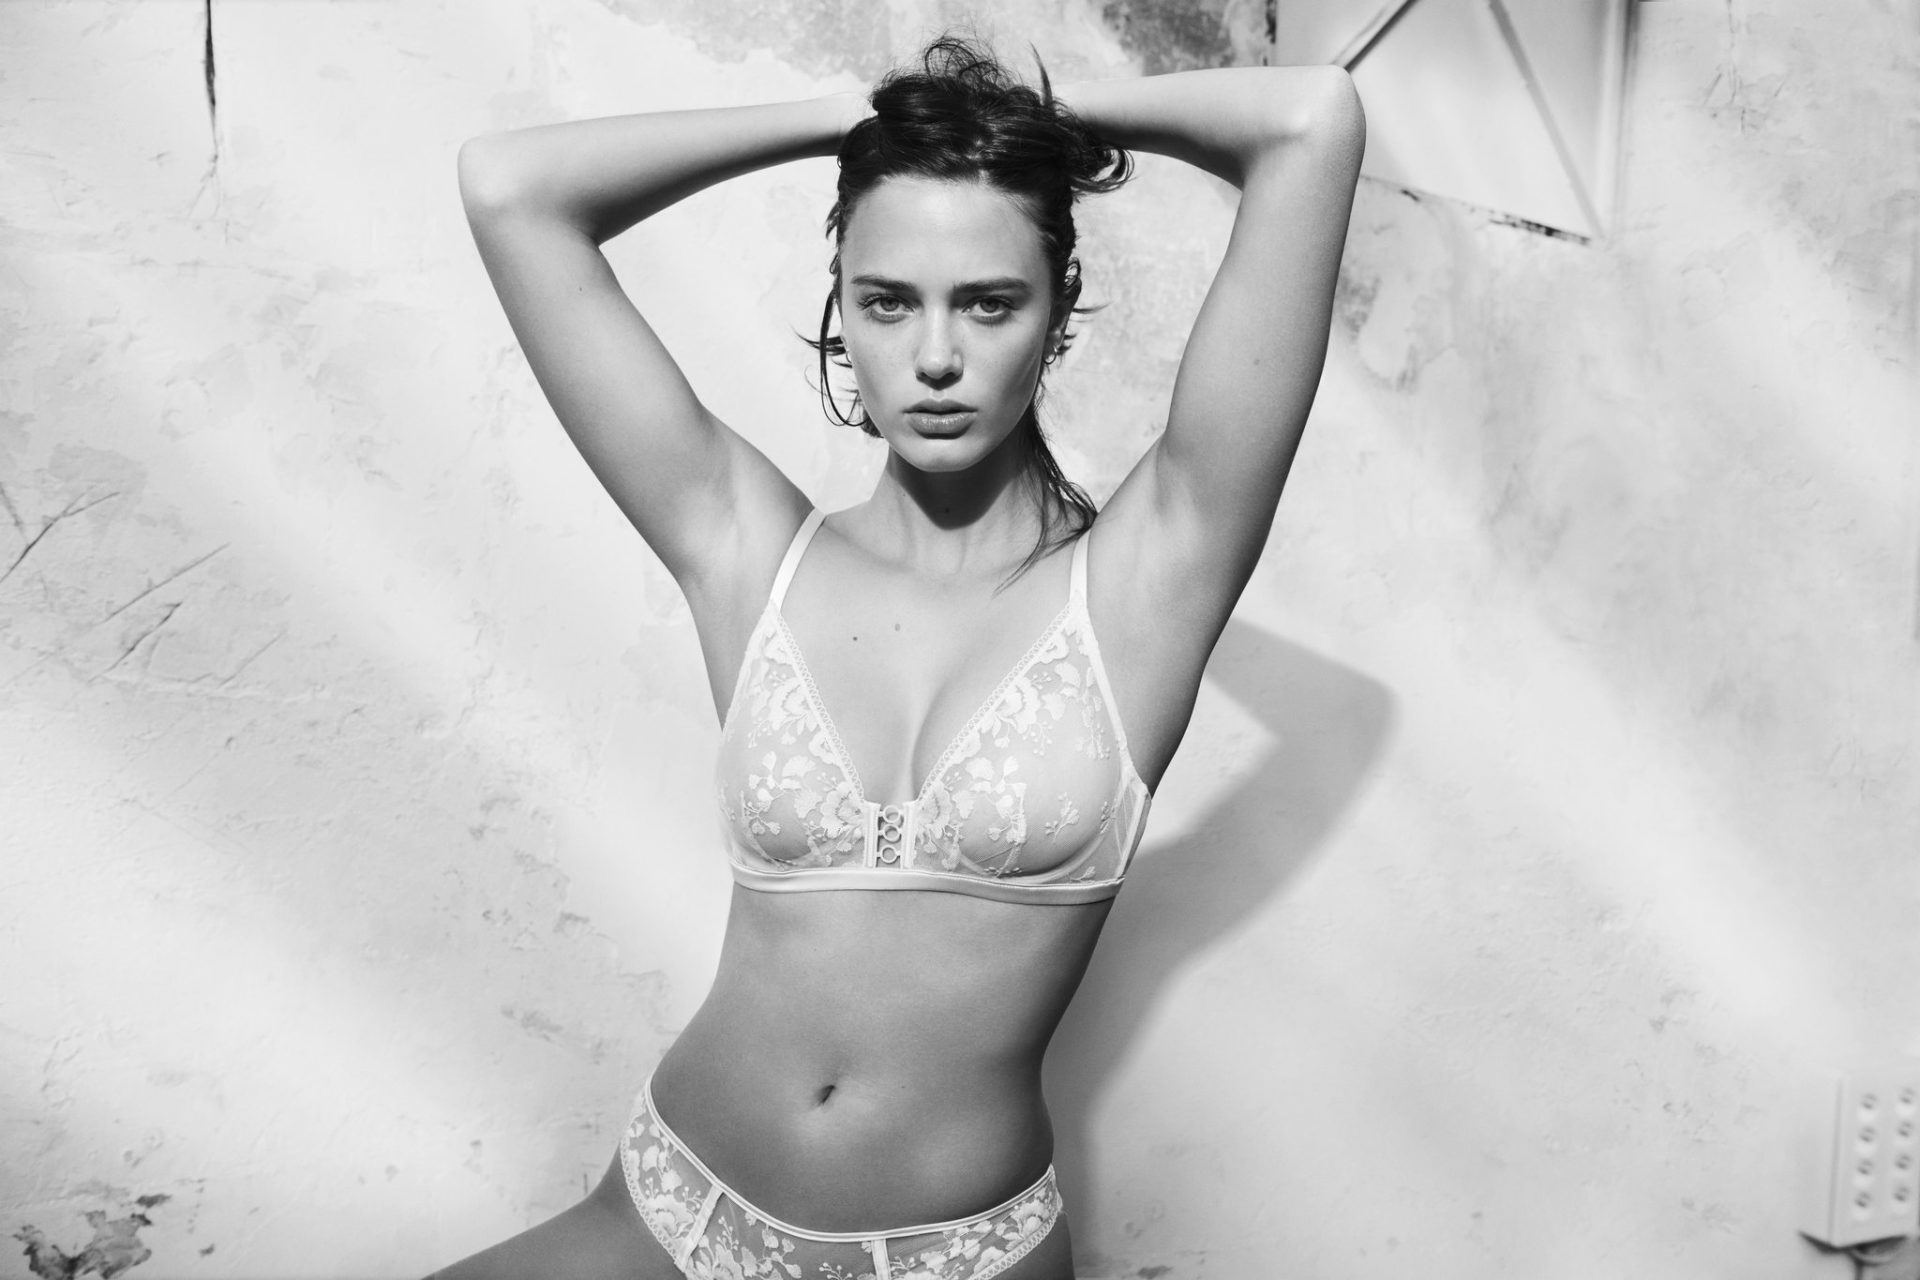 Simone-Perele-lingerie-femme